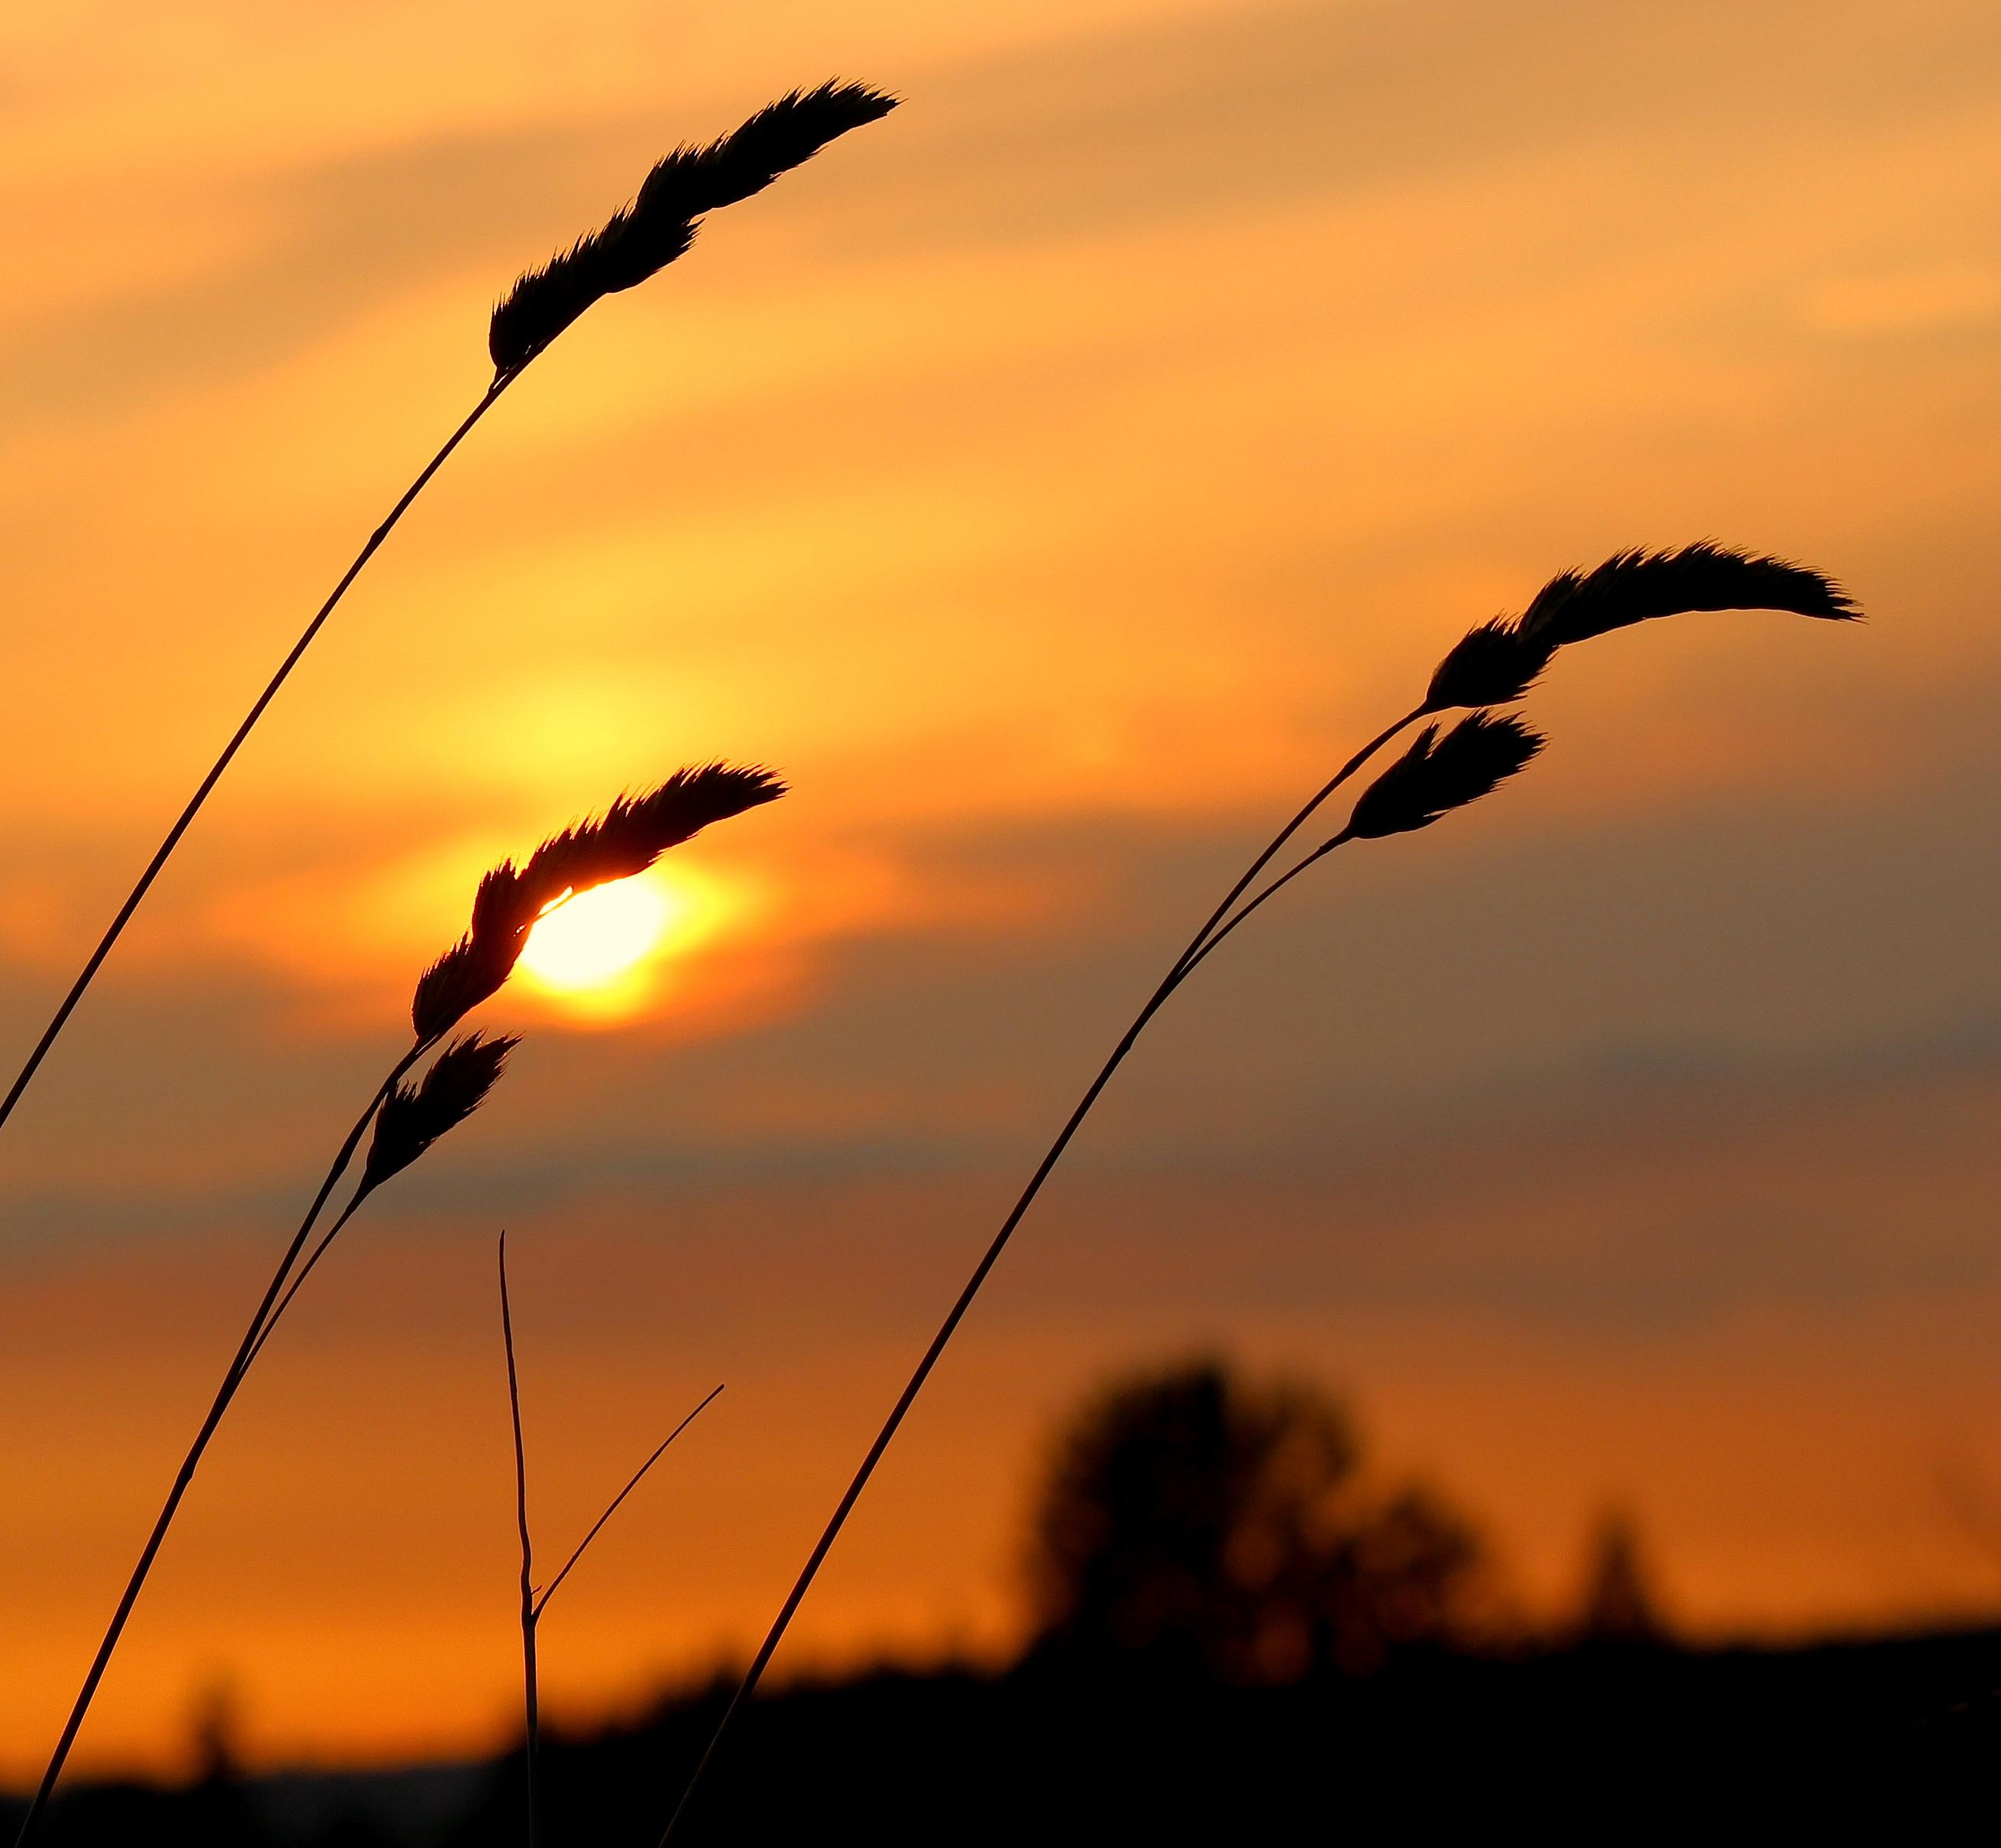 sunset8166